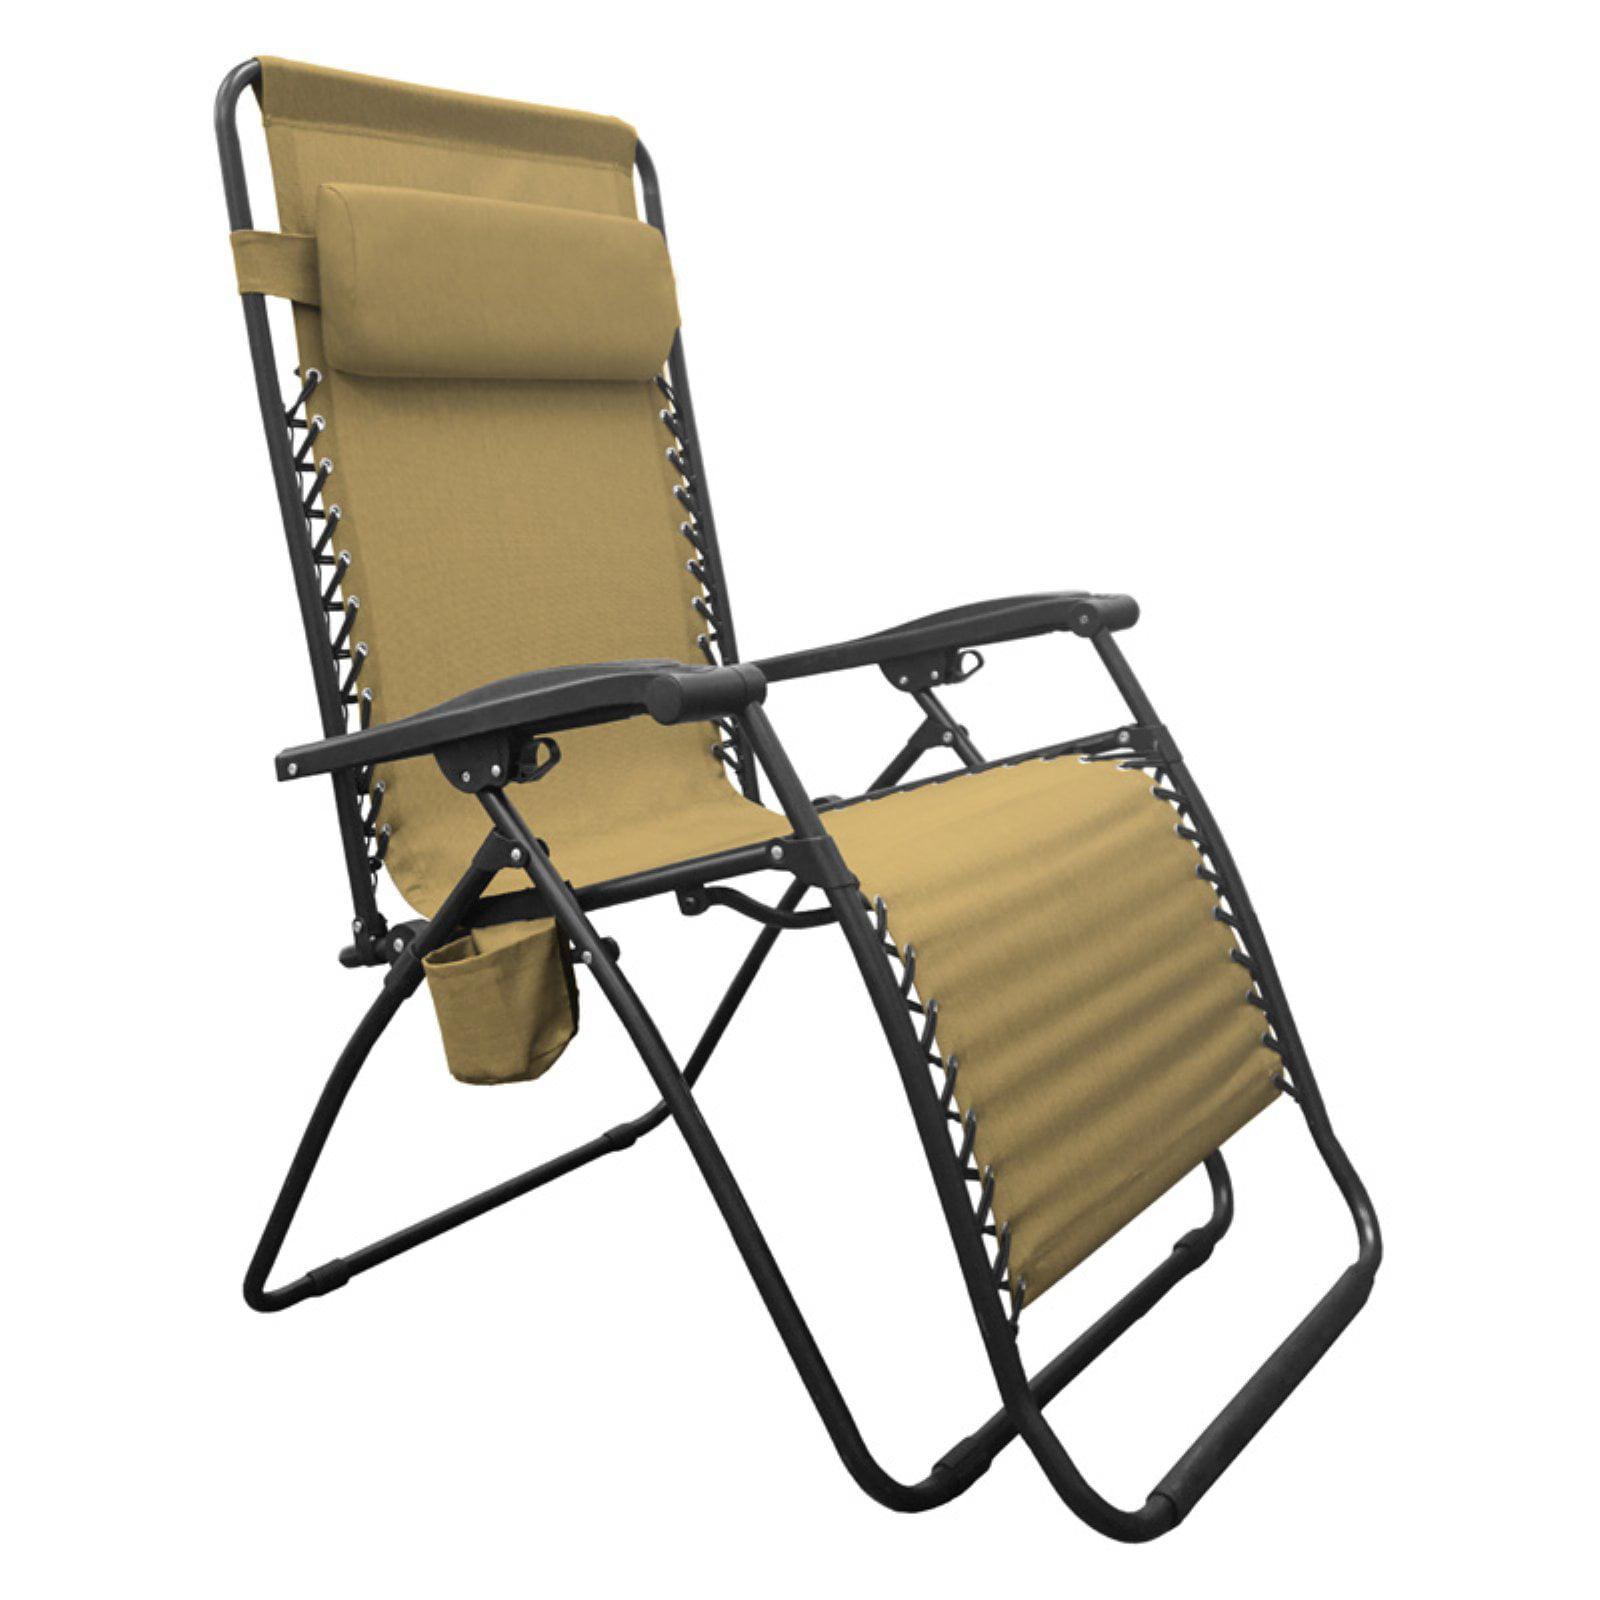 Caravan Sports Infinity Big Boy Zero Gravity Lounge Chair Beige